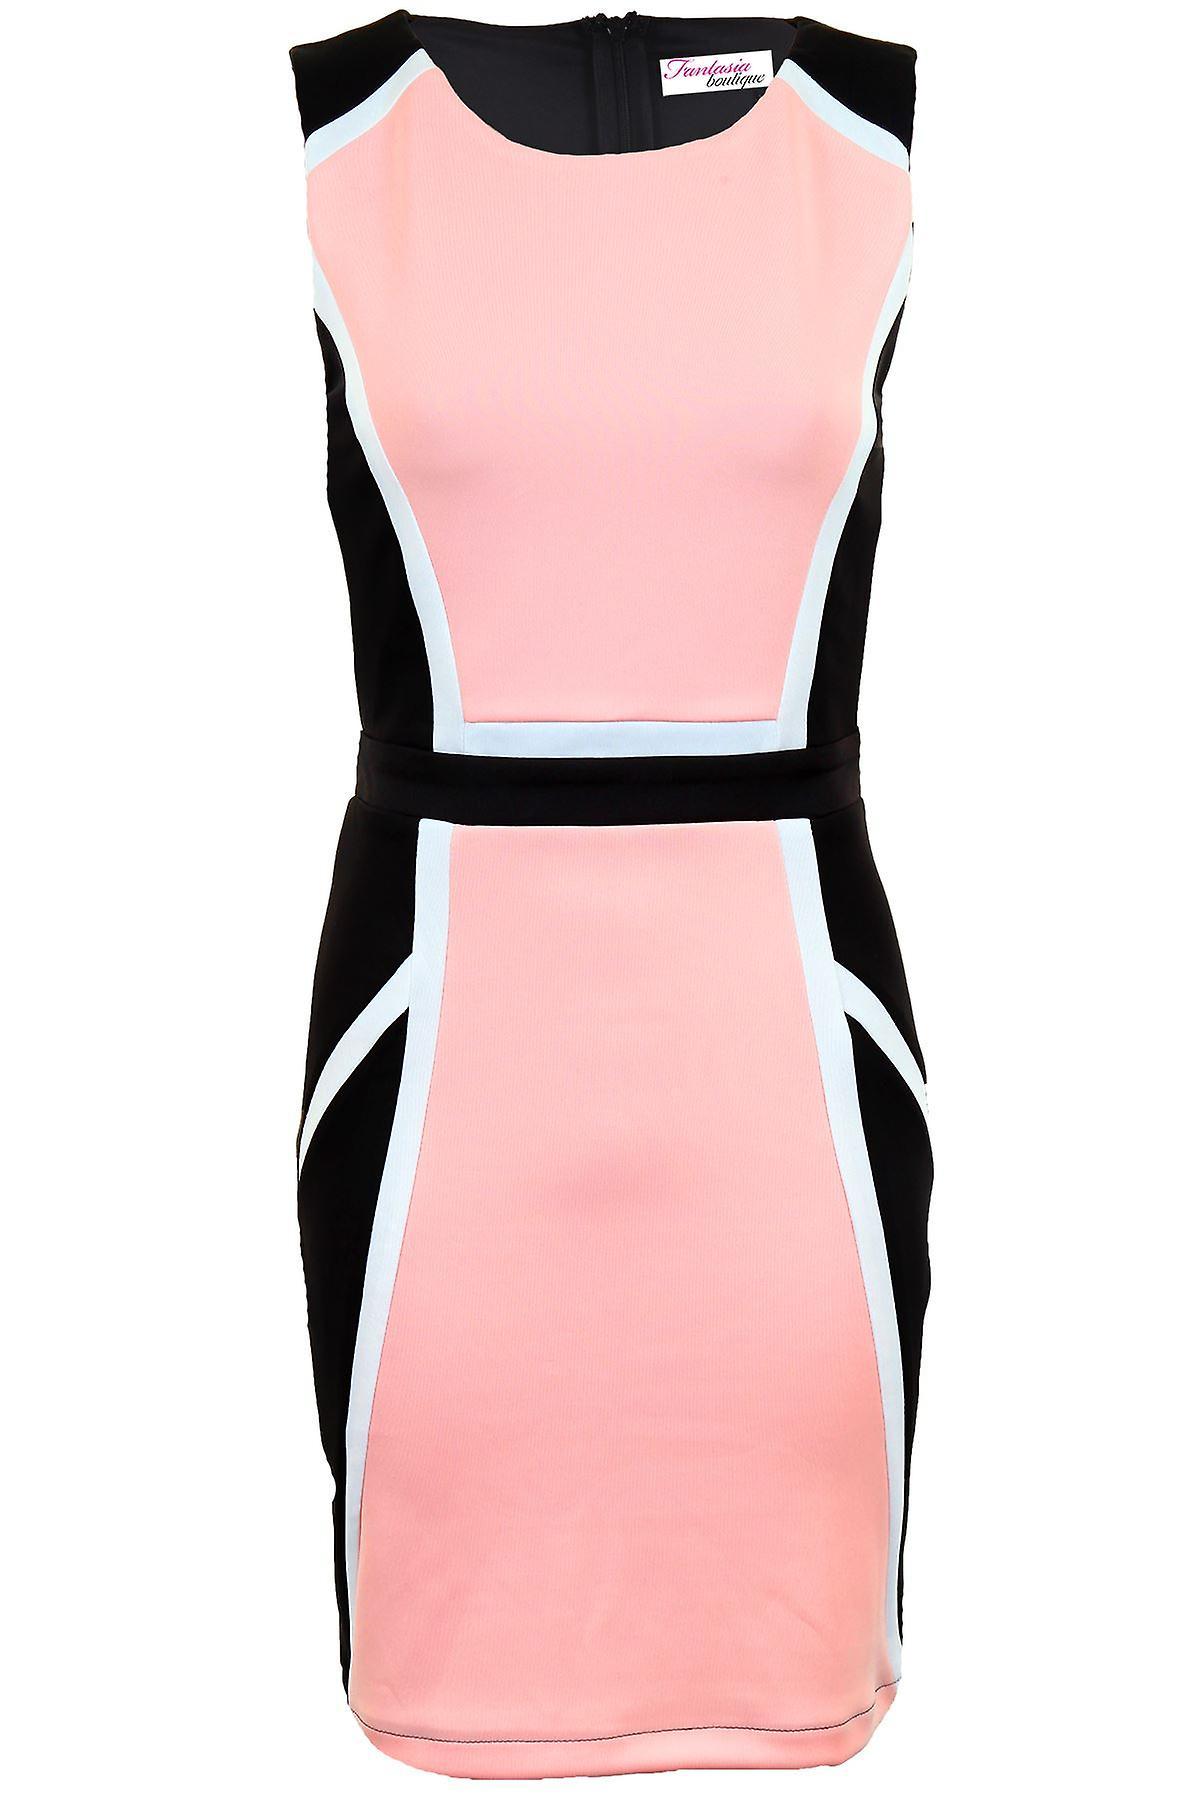 Ladies Sleeveless Black Contrast Panel Women's Bodycon Evening Smart Dress